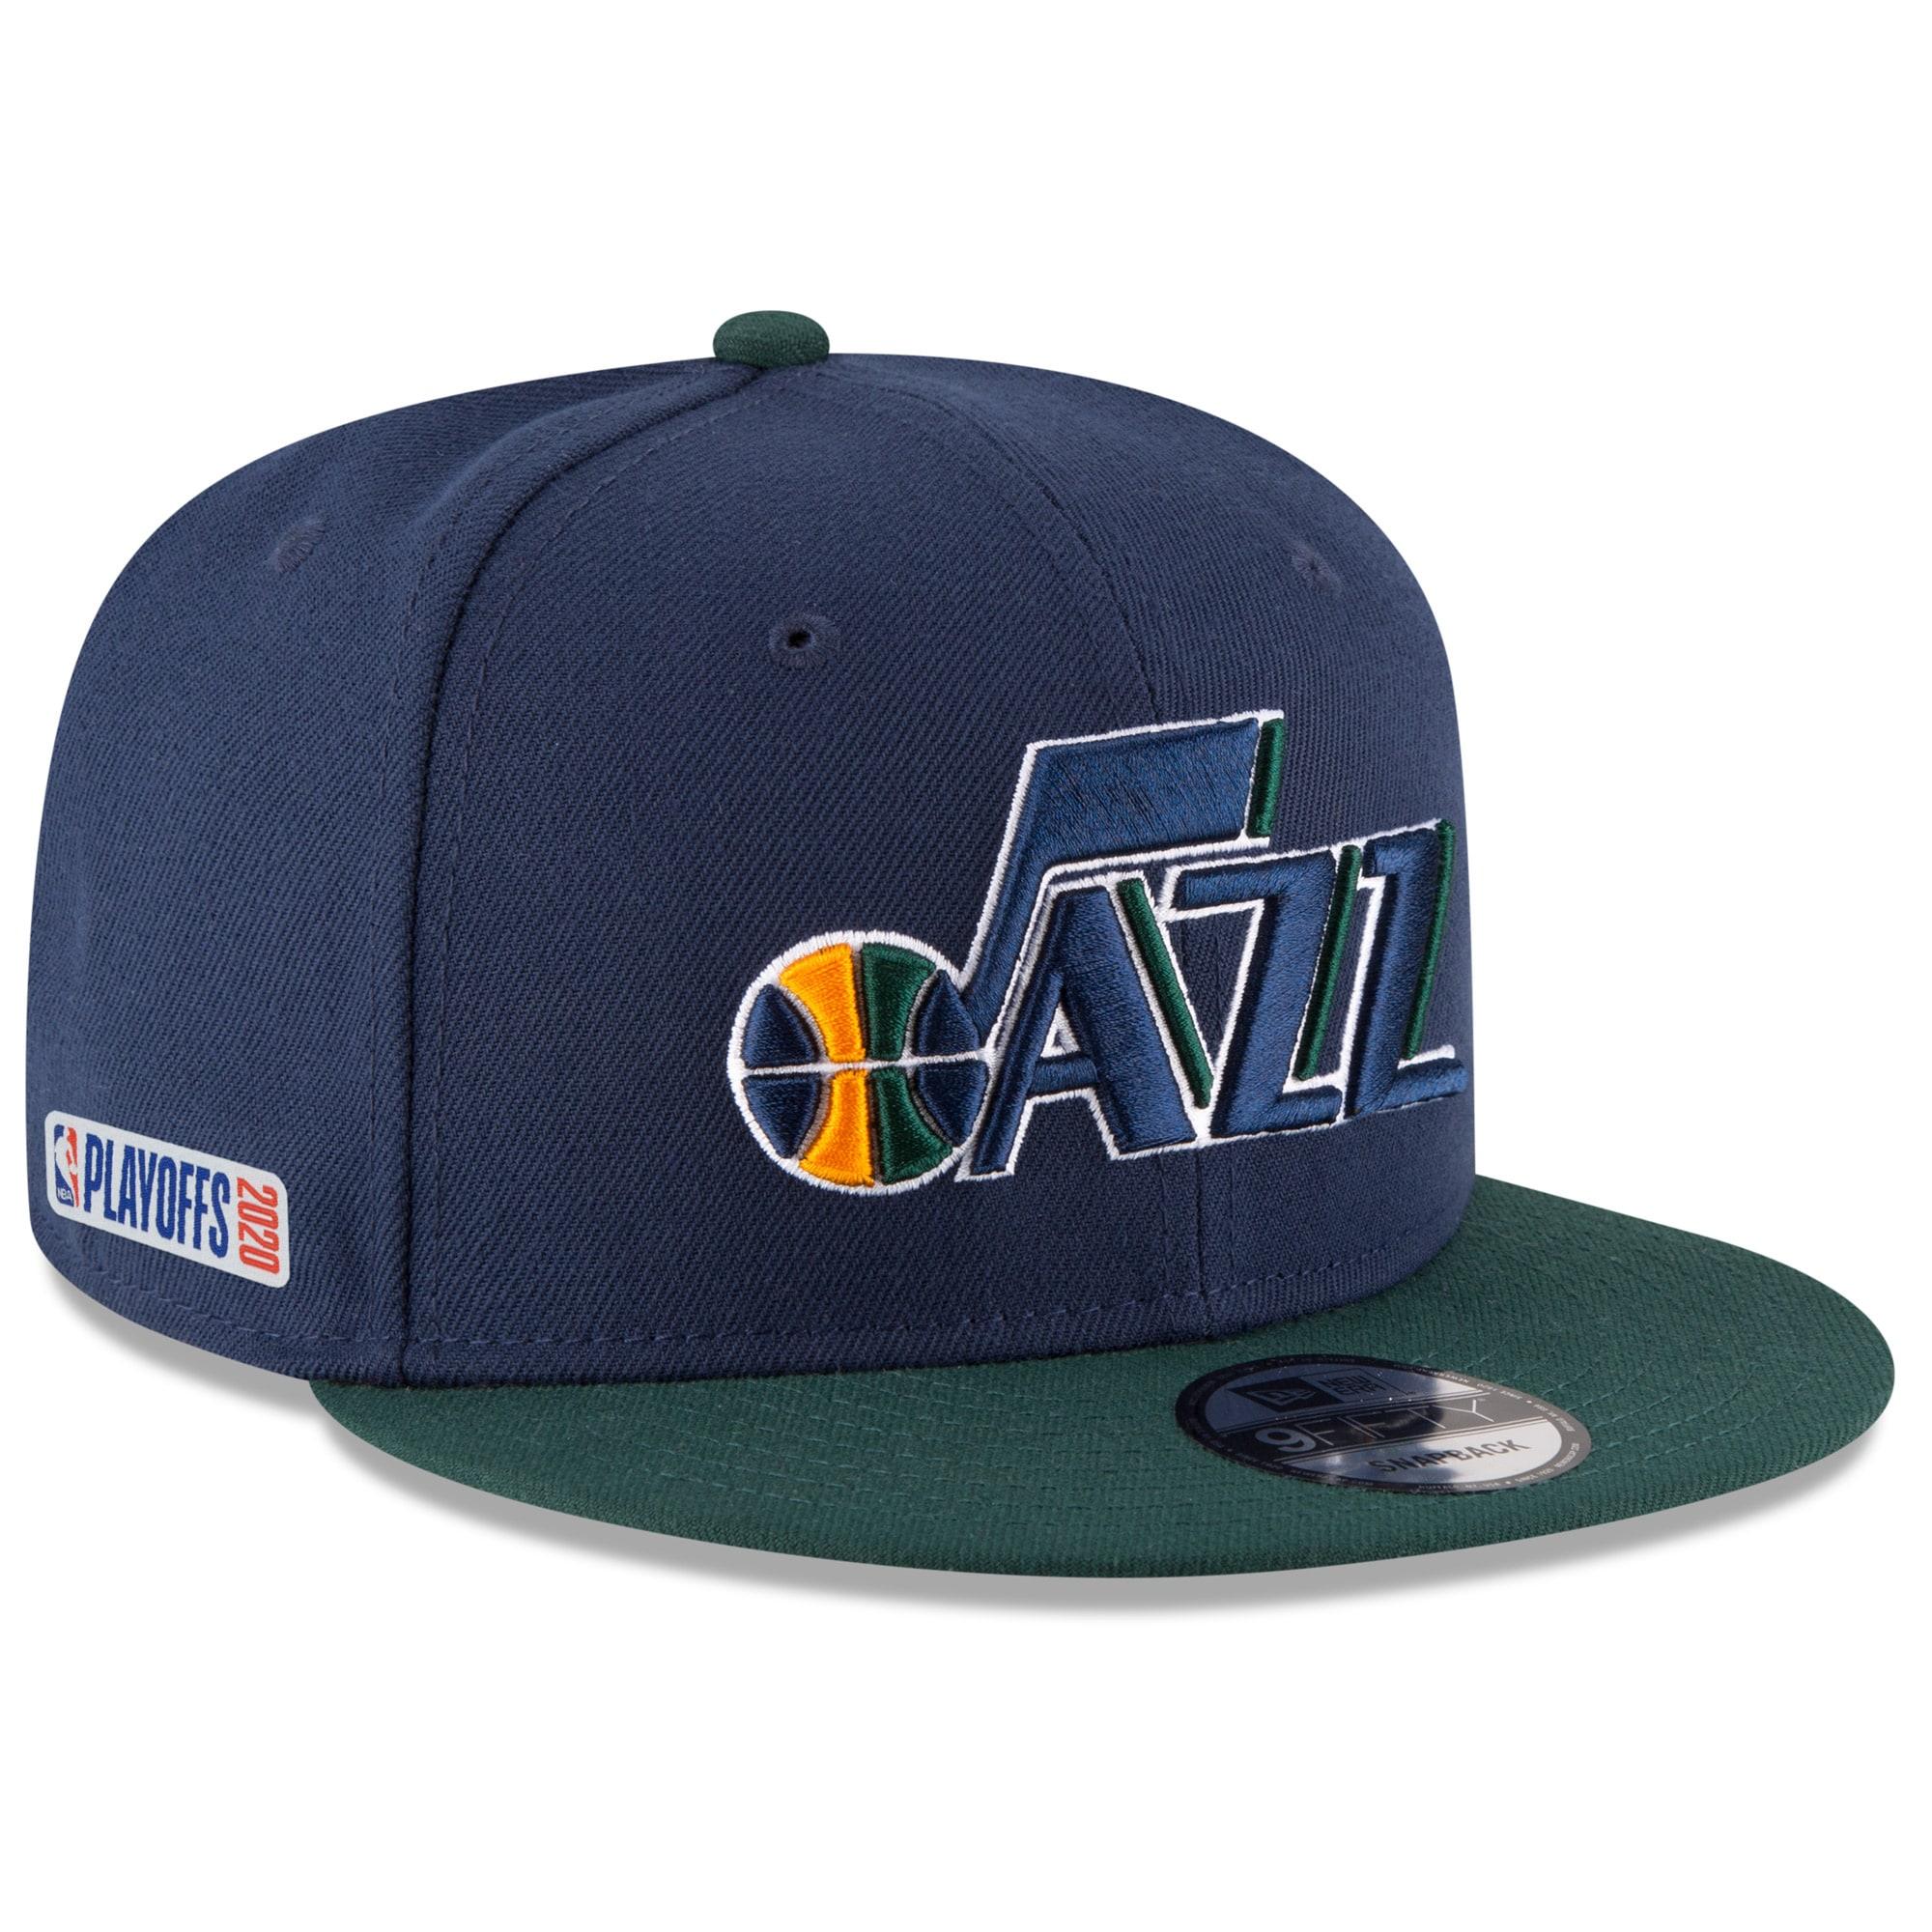 Utah Jazz New Era 2020 NBA Playoffs Bound 2-Tone 9FIFTY Snapback Adjustable Hat - Navy